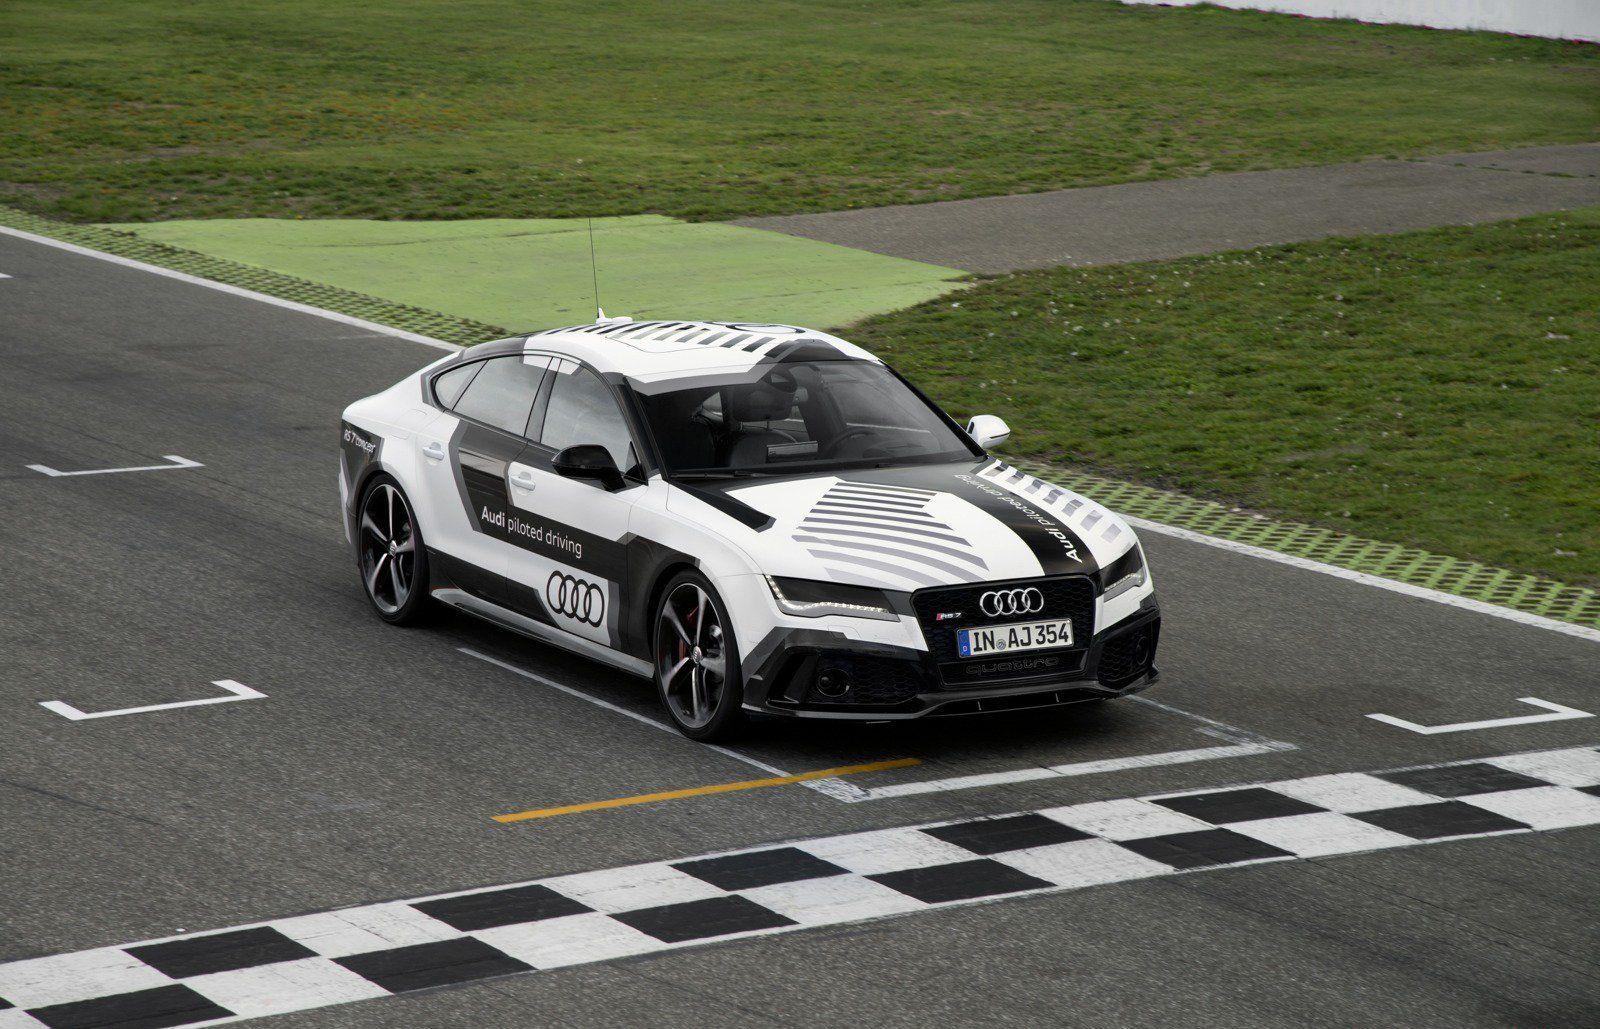 audi%2Bvasiki To 2016 έρχονται οι αγώνες αυτόνομων αυτοκινήτων! Audi, Audi RS7, zblog, αγωνες